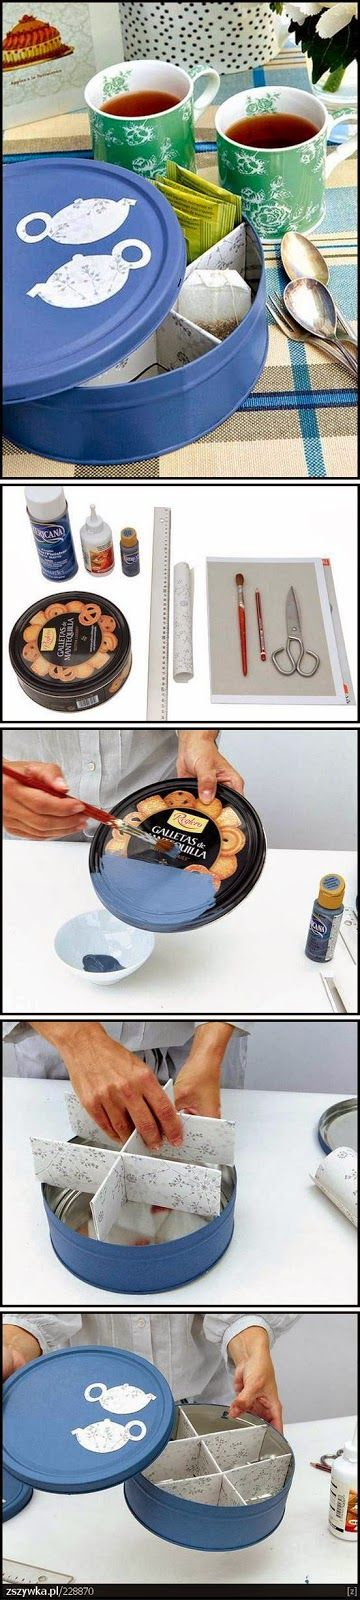 DIY Collection : DIY Great Ideashttp://diycollection1.blogspot.com/2014/04/diy-great-ideas.html